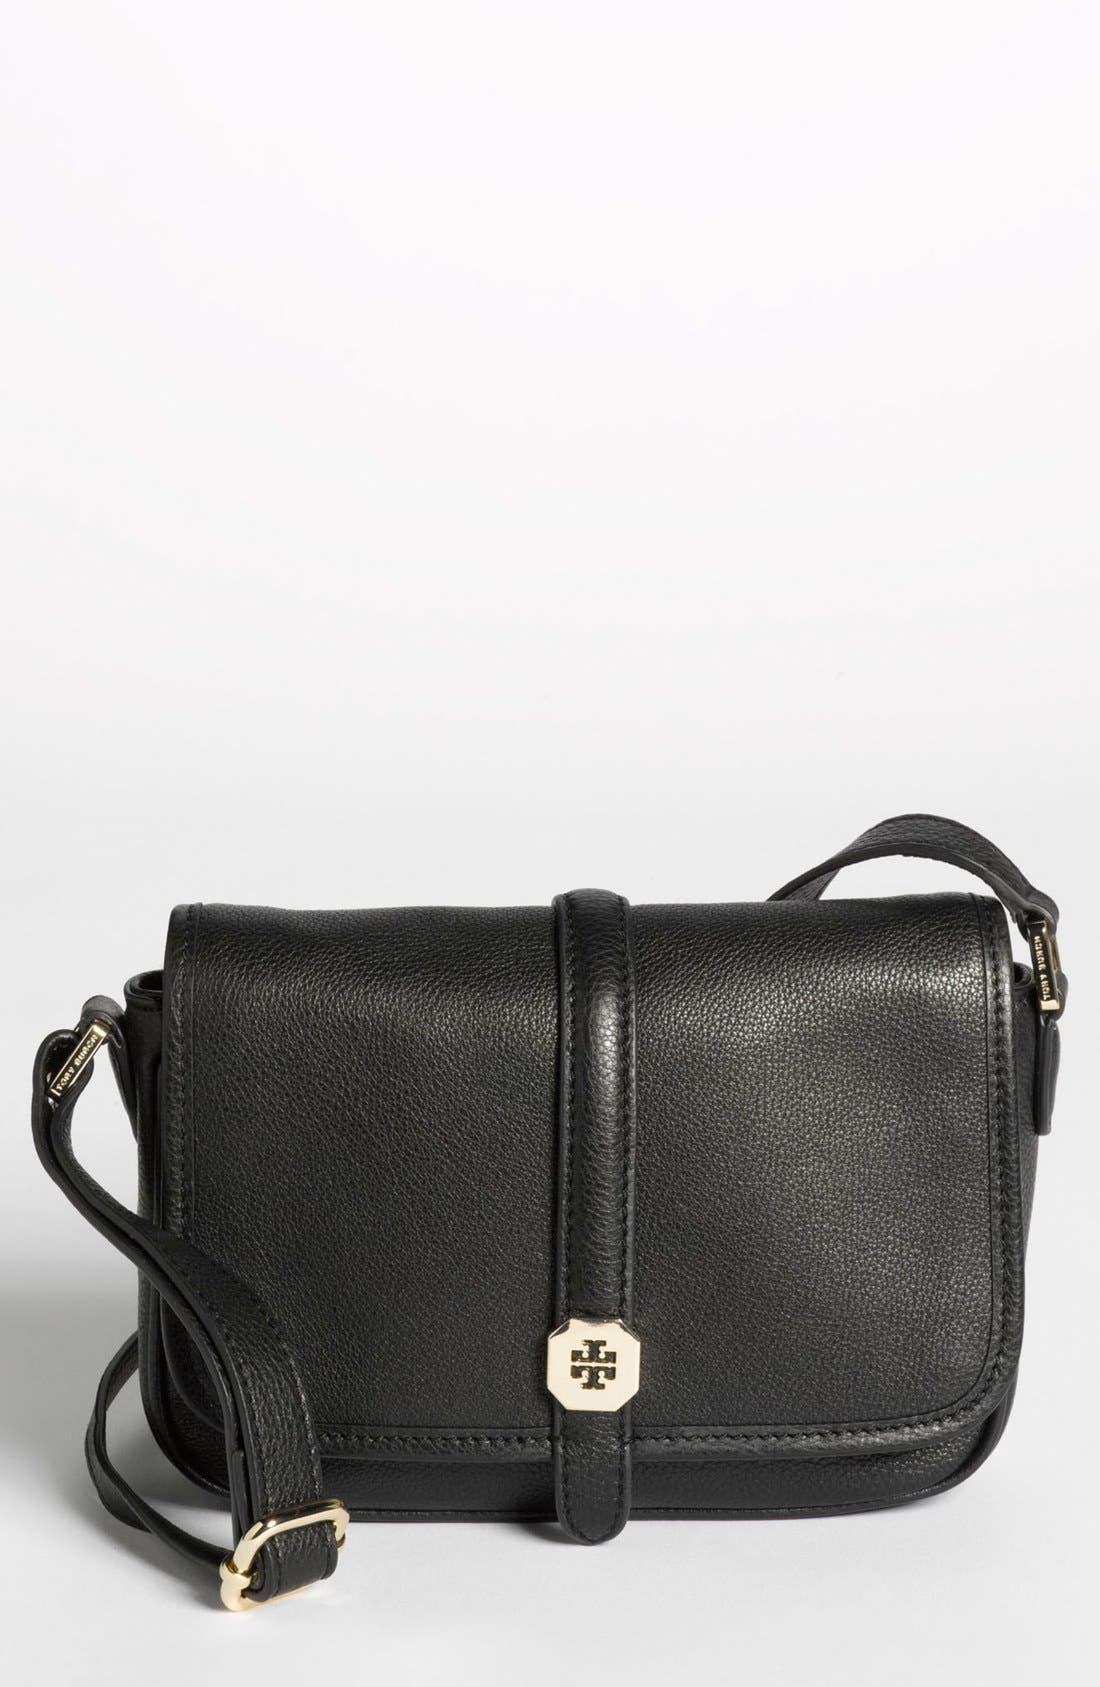 Main Image - Tory Burch 'Clay - Mini' Leather Crossbody Bag